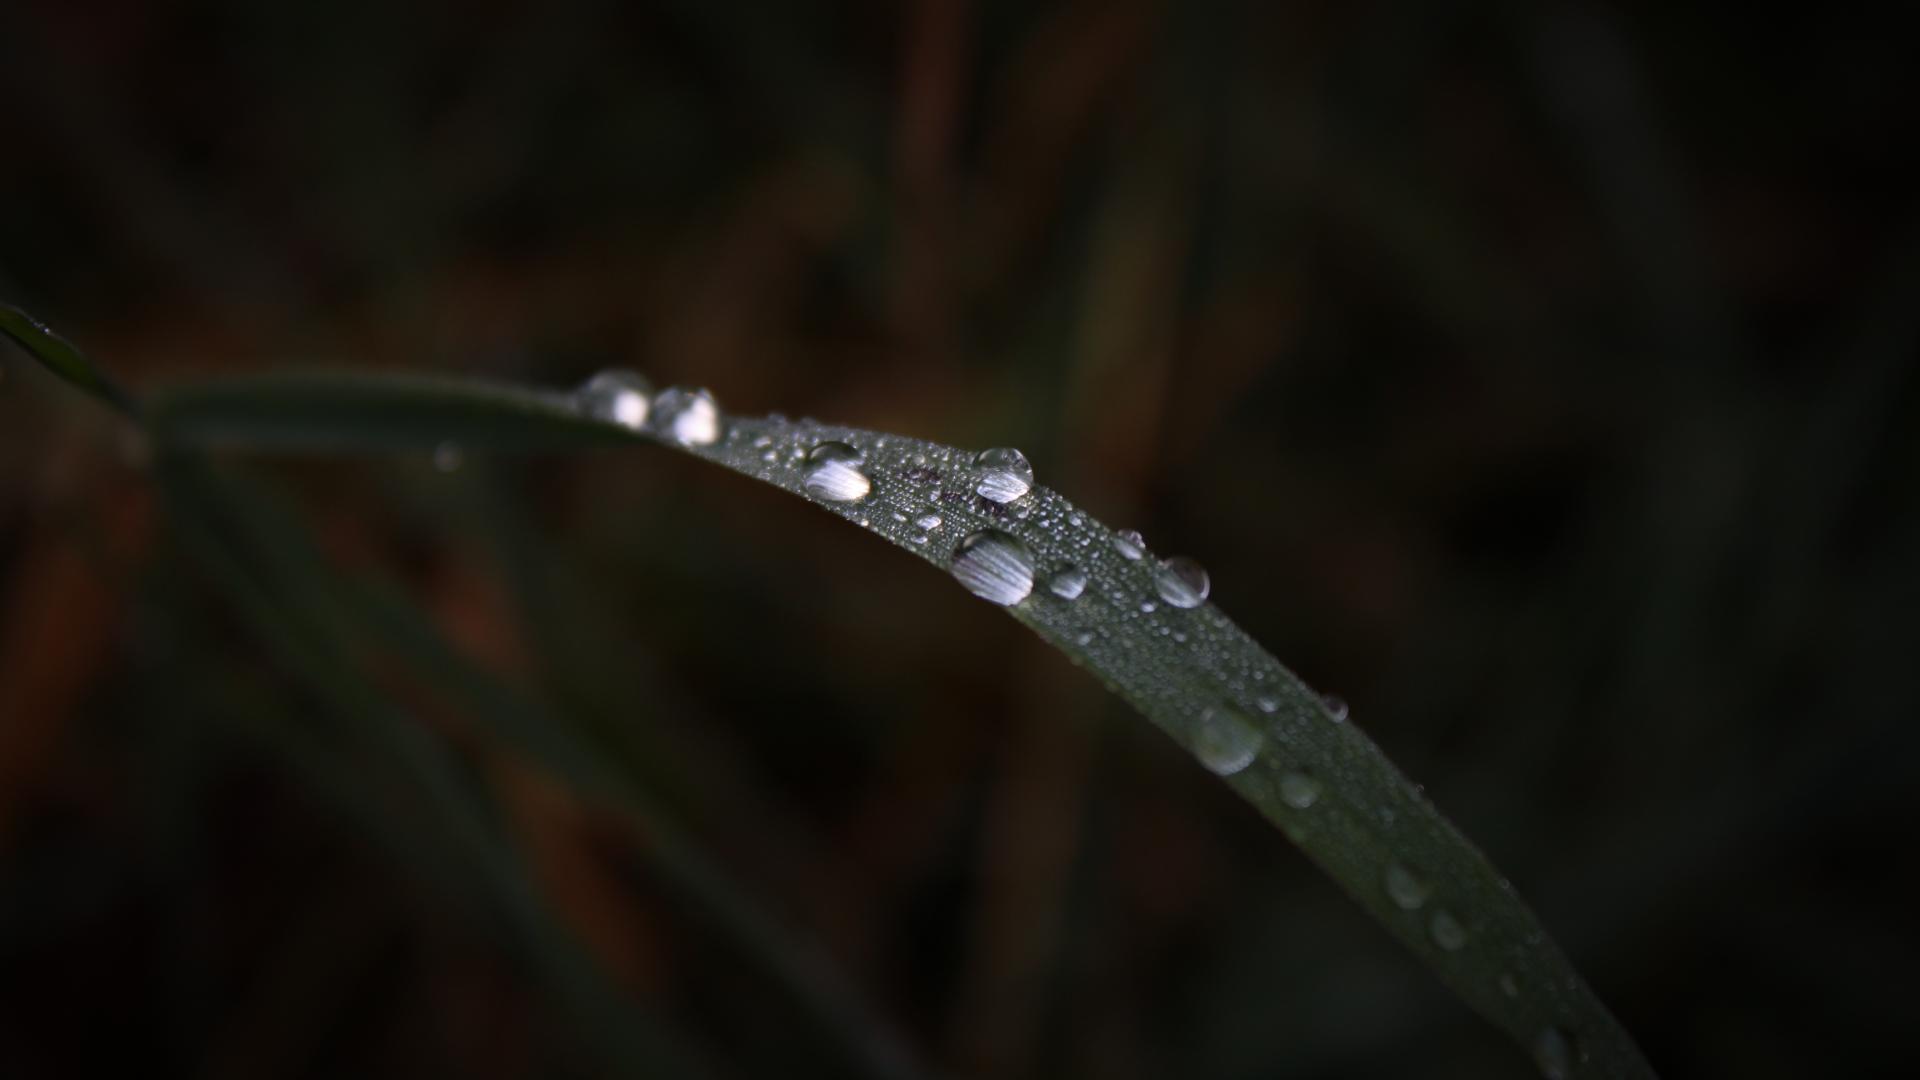 General 1920x1080 nature macro water rain grass closeup plants water drops